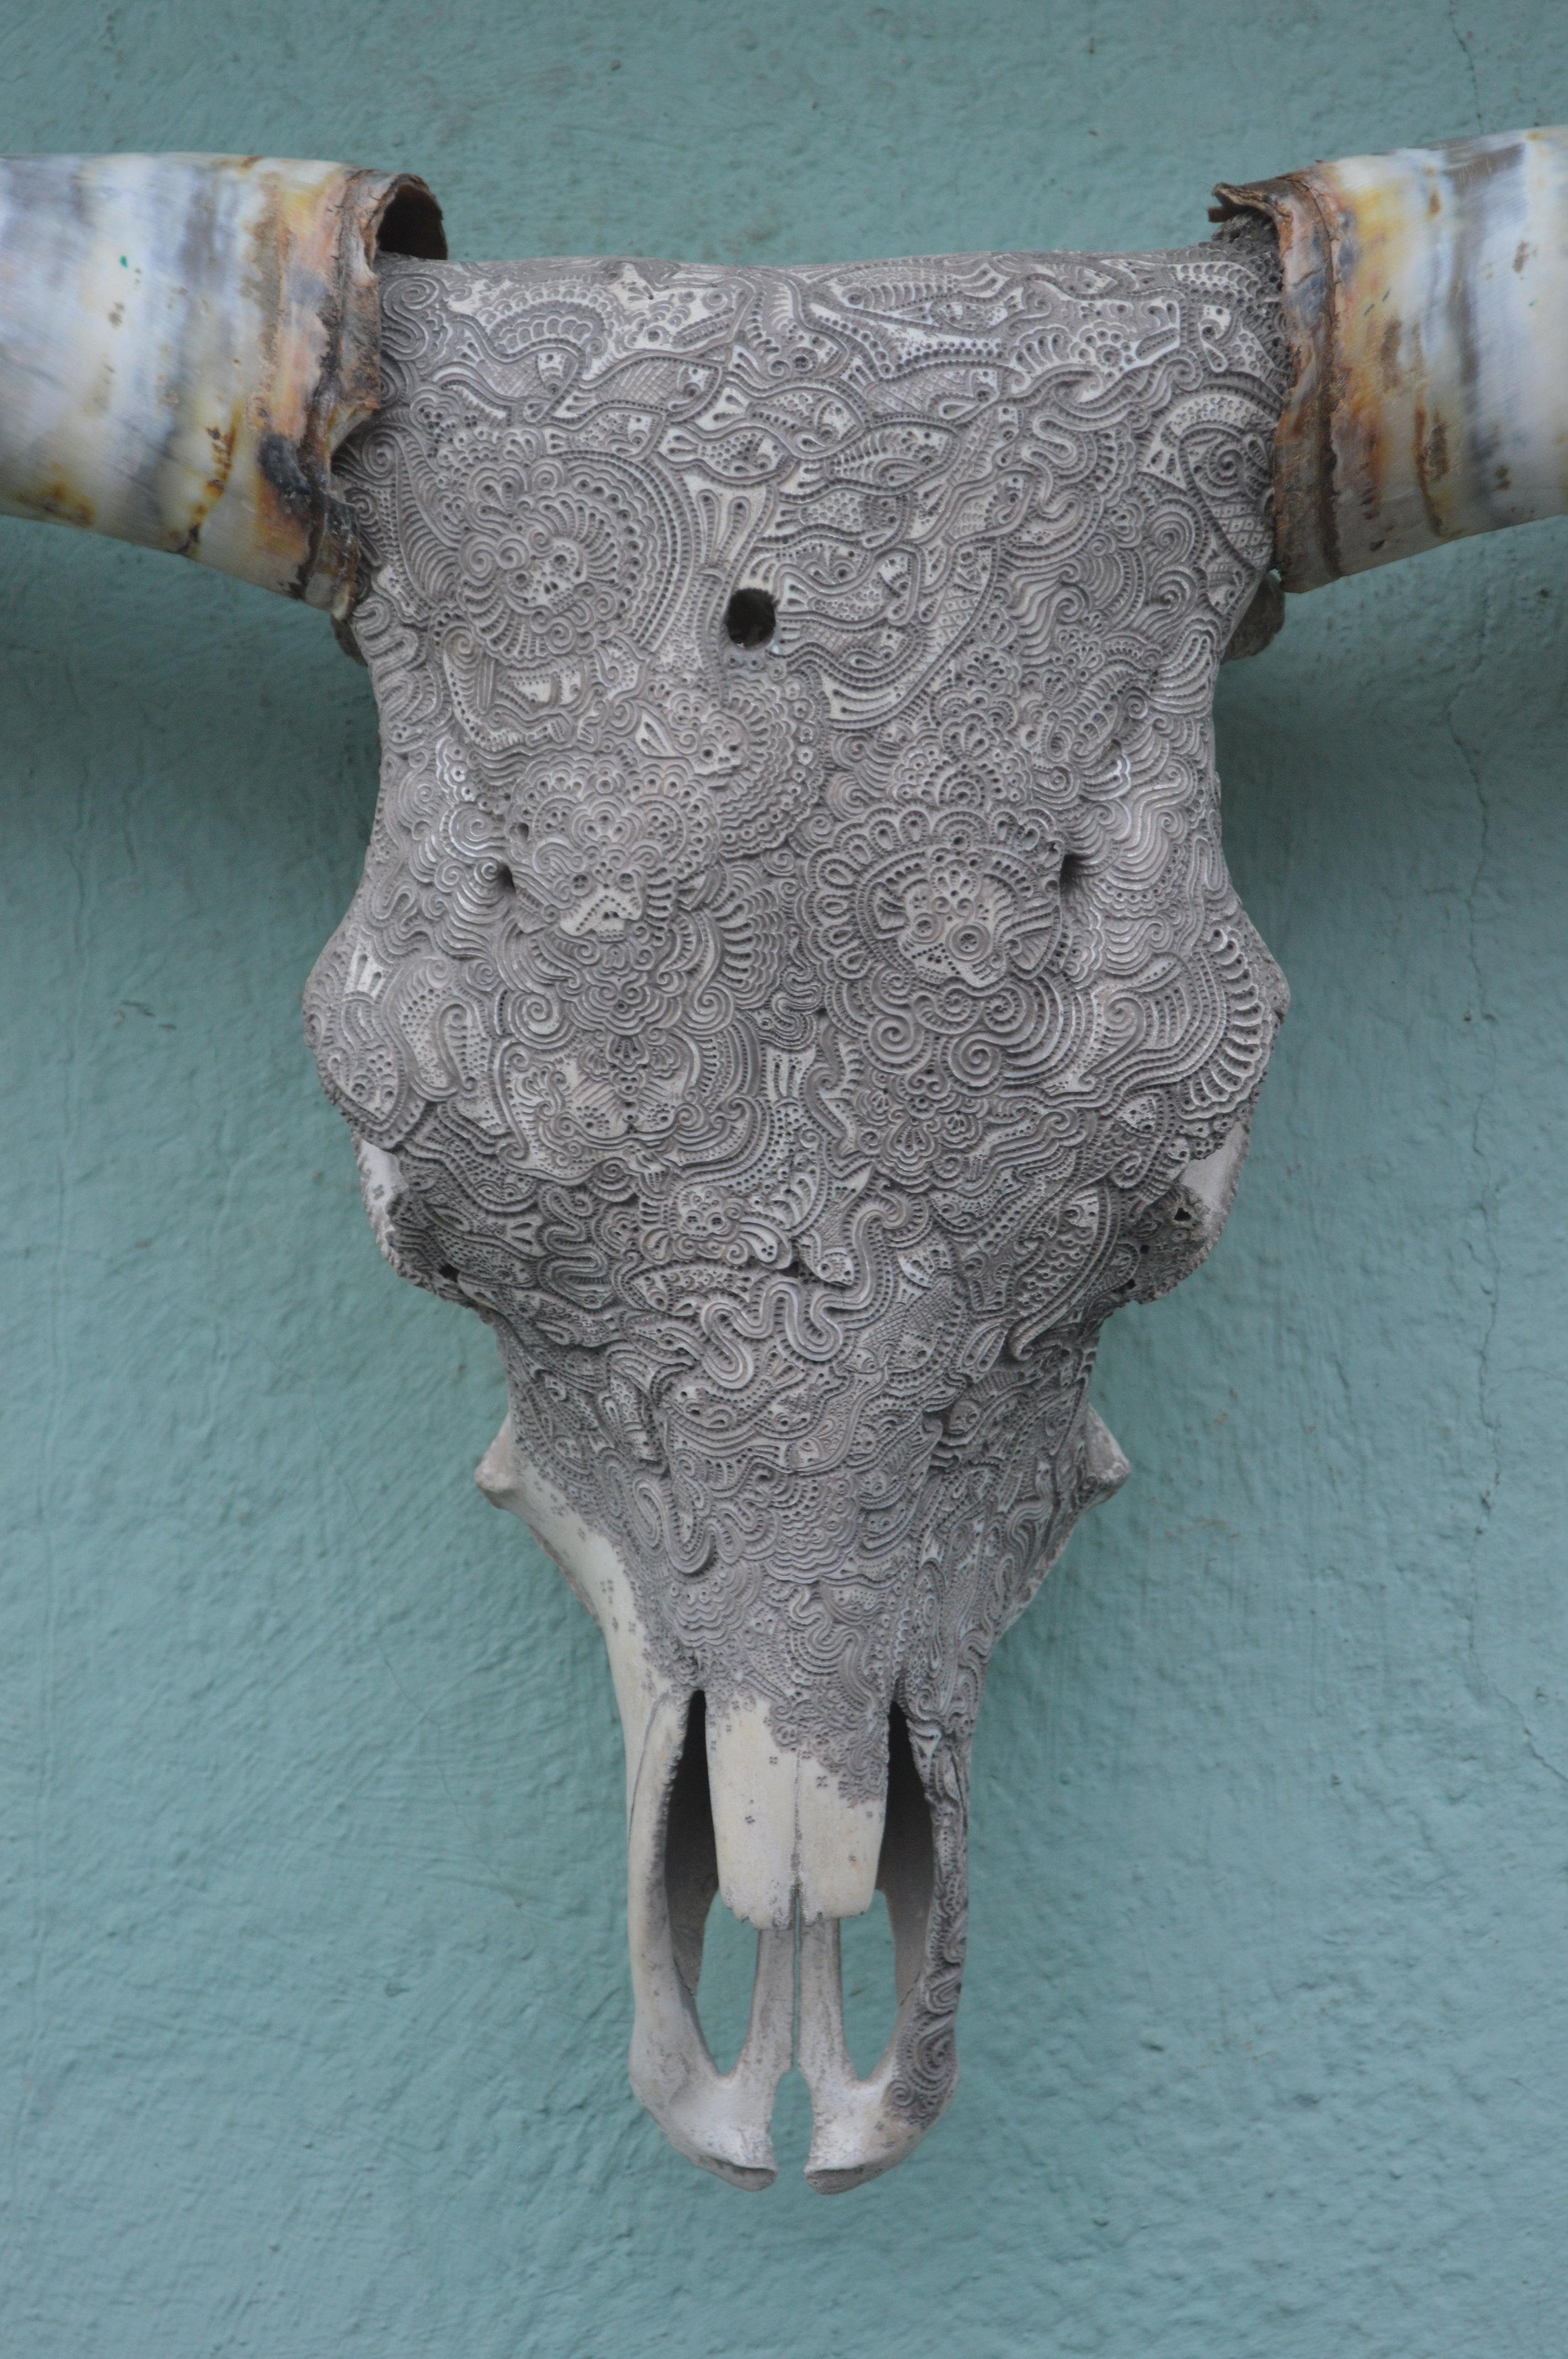 skullpture-vulture-culture-bone-work.JPG